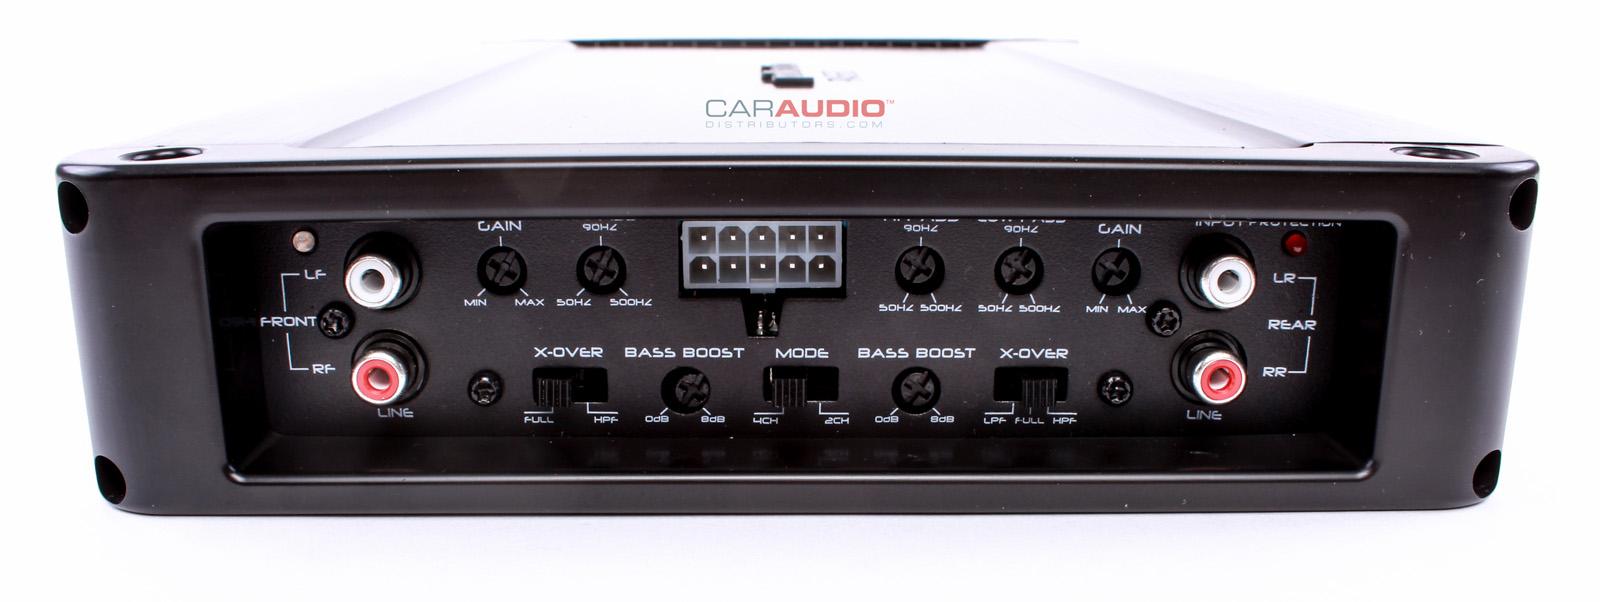 new polk audio pa660 4 channel class a b 600 watts car. Black Bedroom Furniture Sets. Home Design Ideas